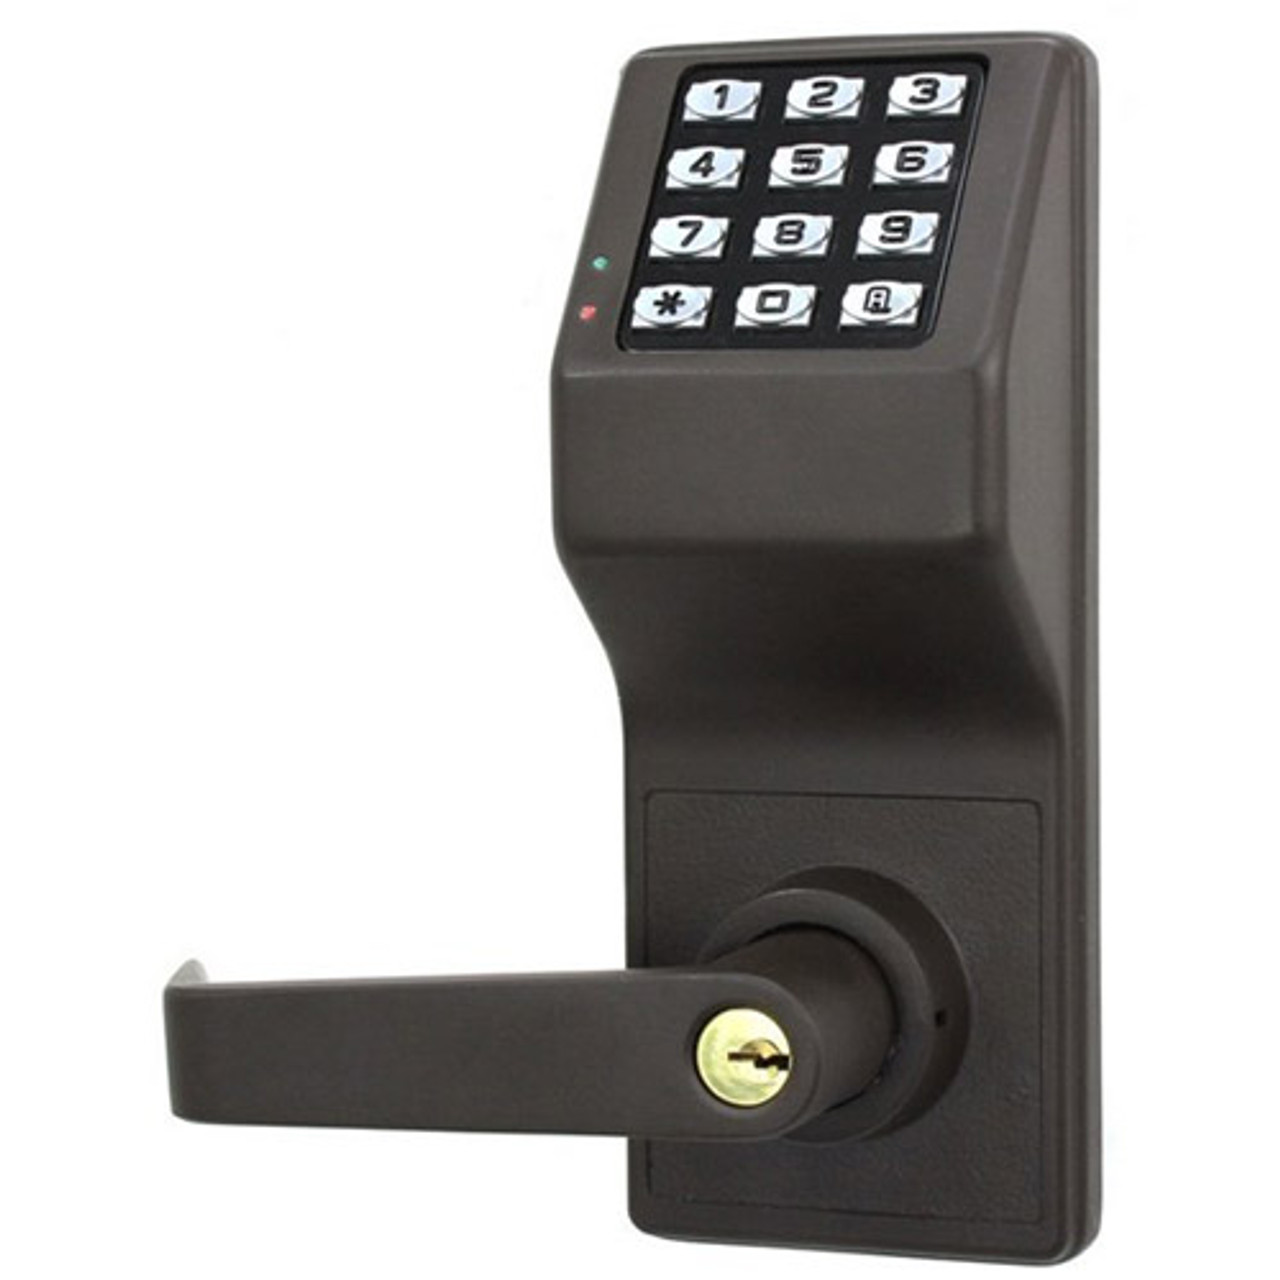 DL3000WPIC-S-US10B Alarm Lock Trilogy Electronic Digital Lock in Duronodic Finish